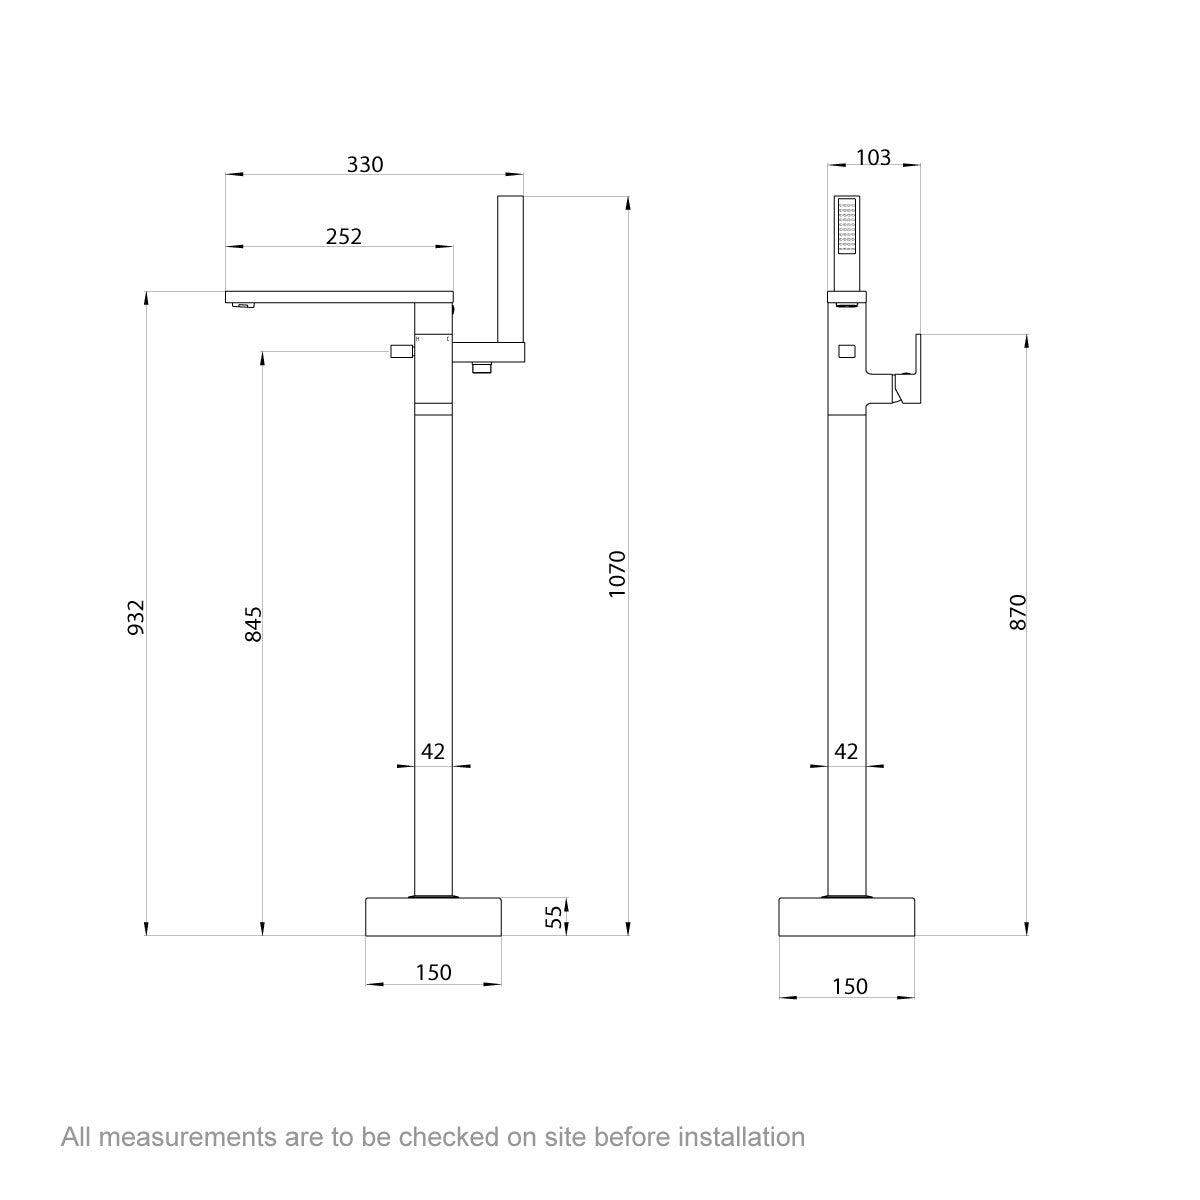 Dimensions for Mode Ellis freestanding bath filler tap